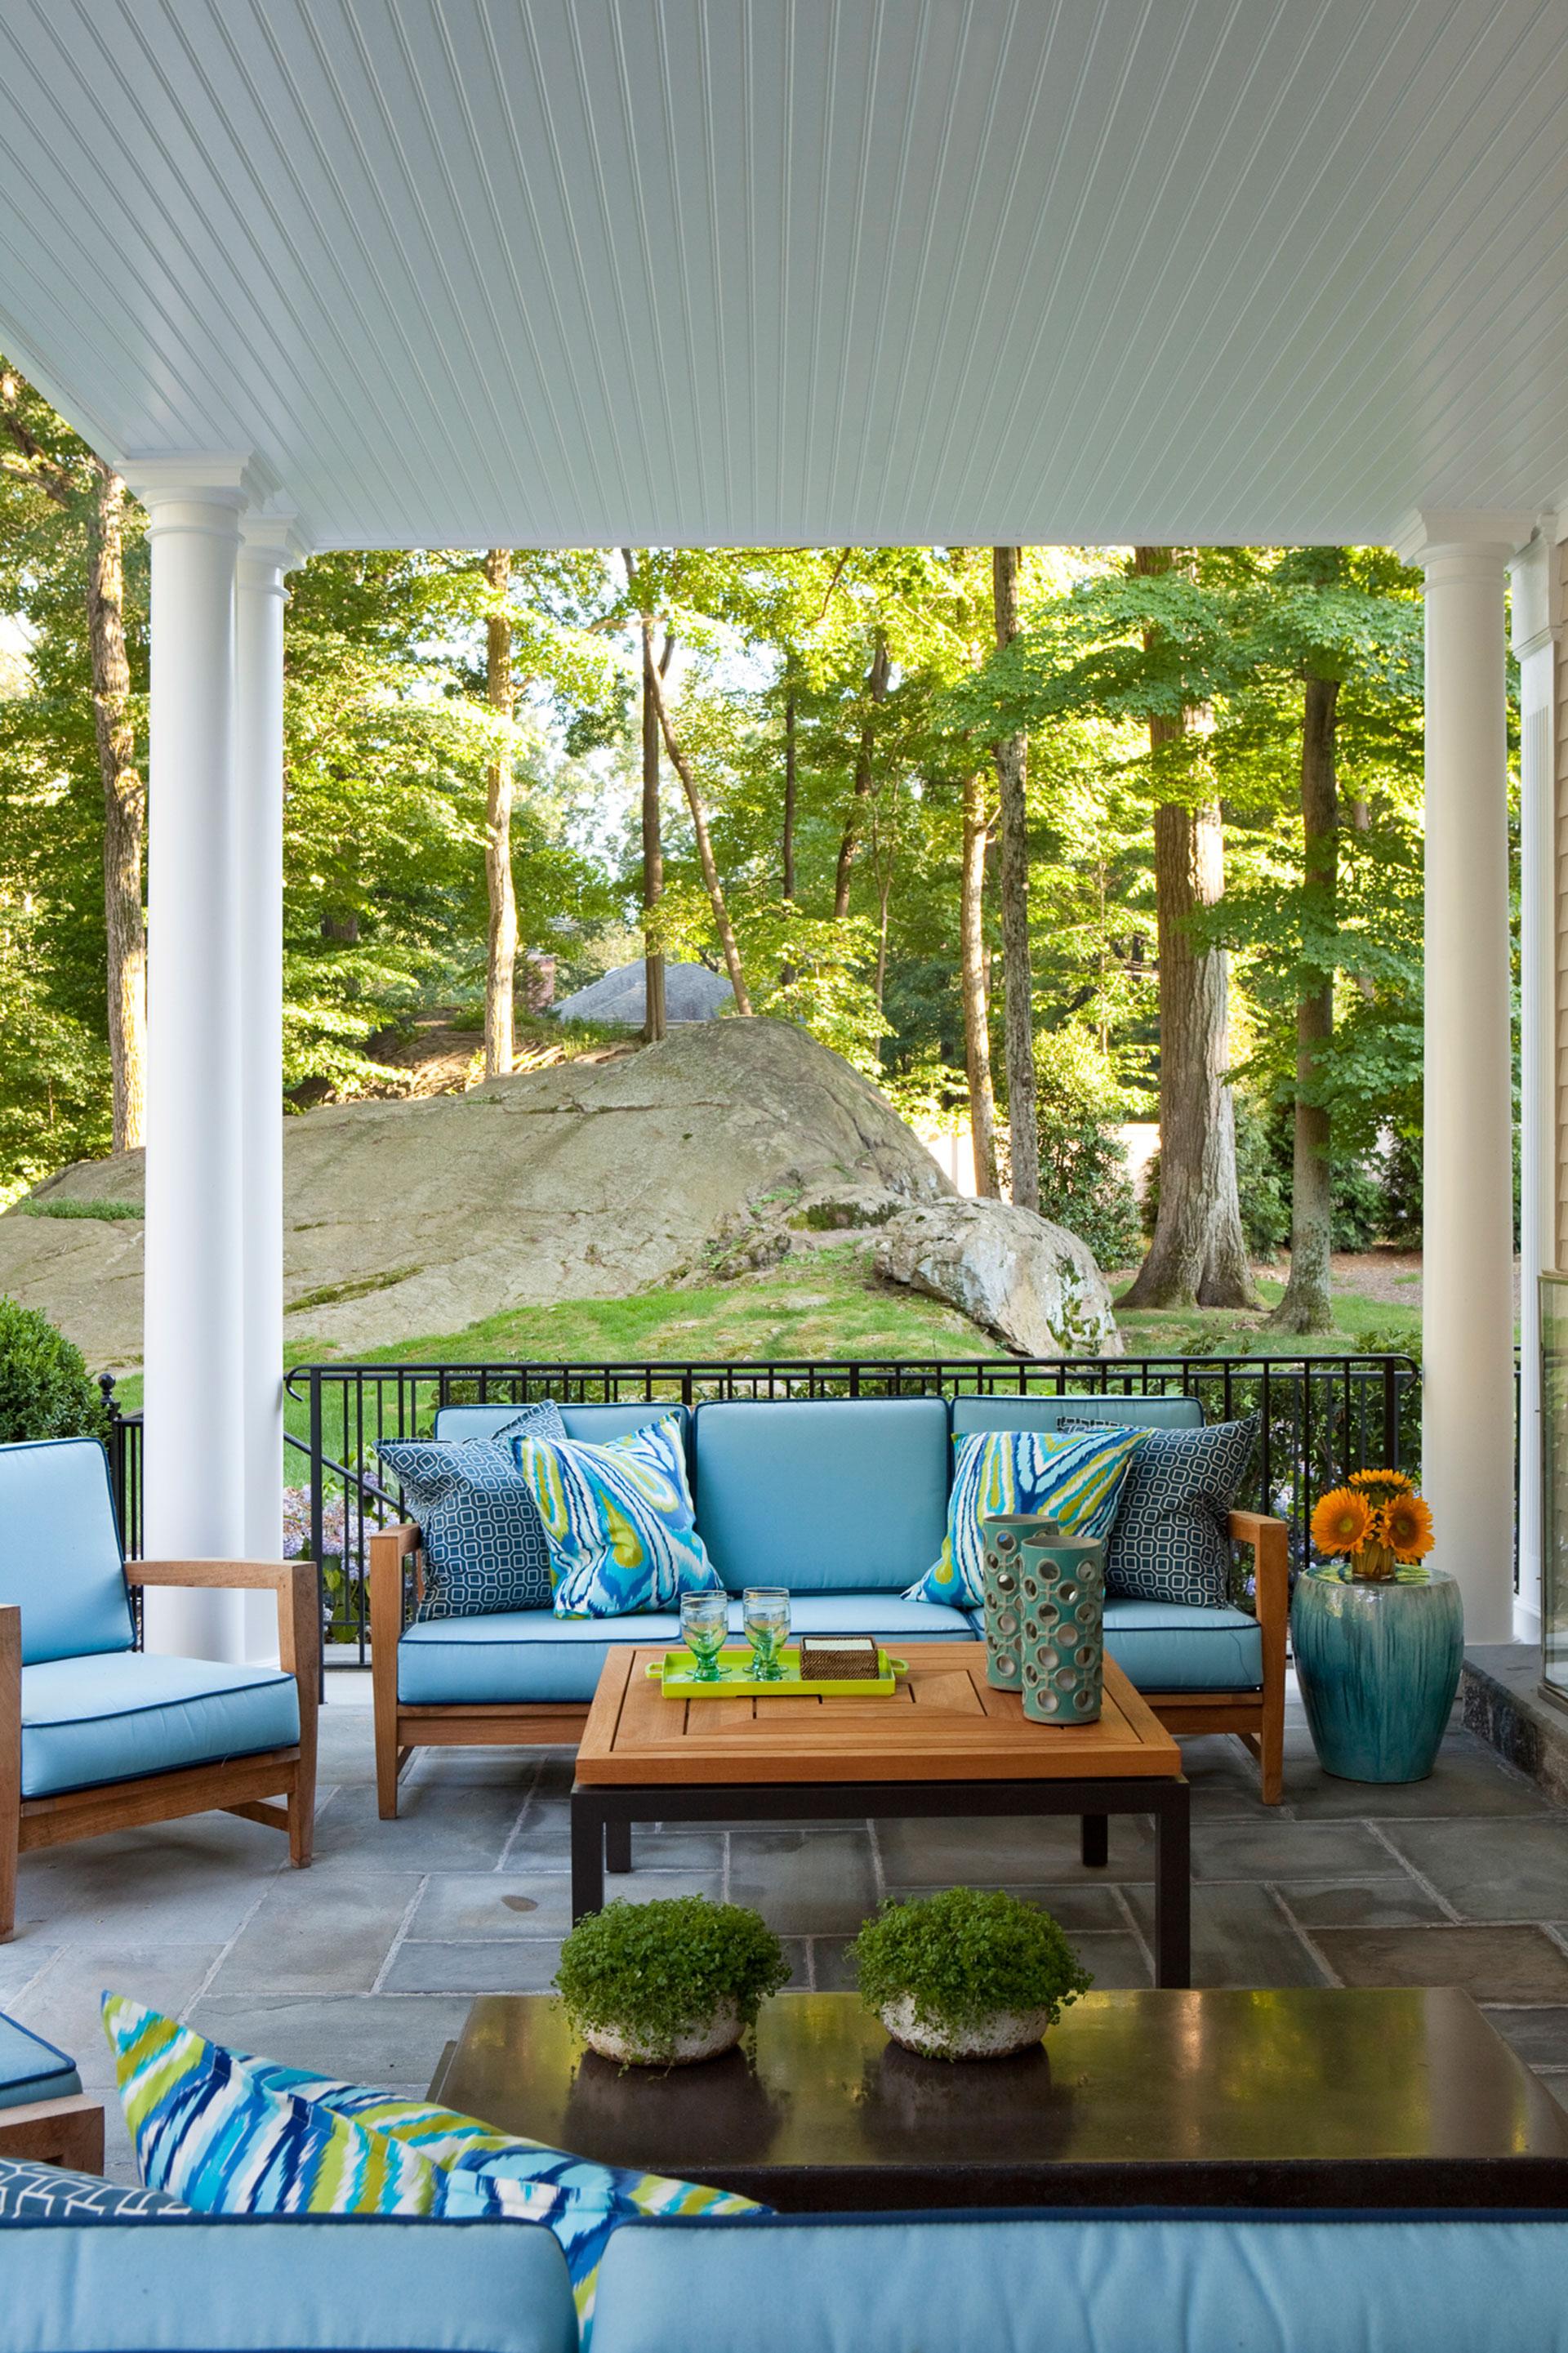 Patio Design Ideas Porch Styles - Good housekeeping patio furniture